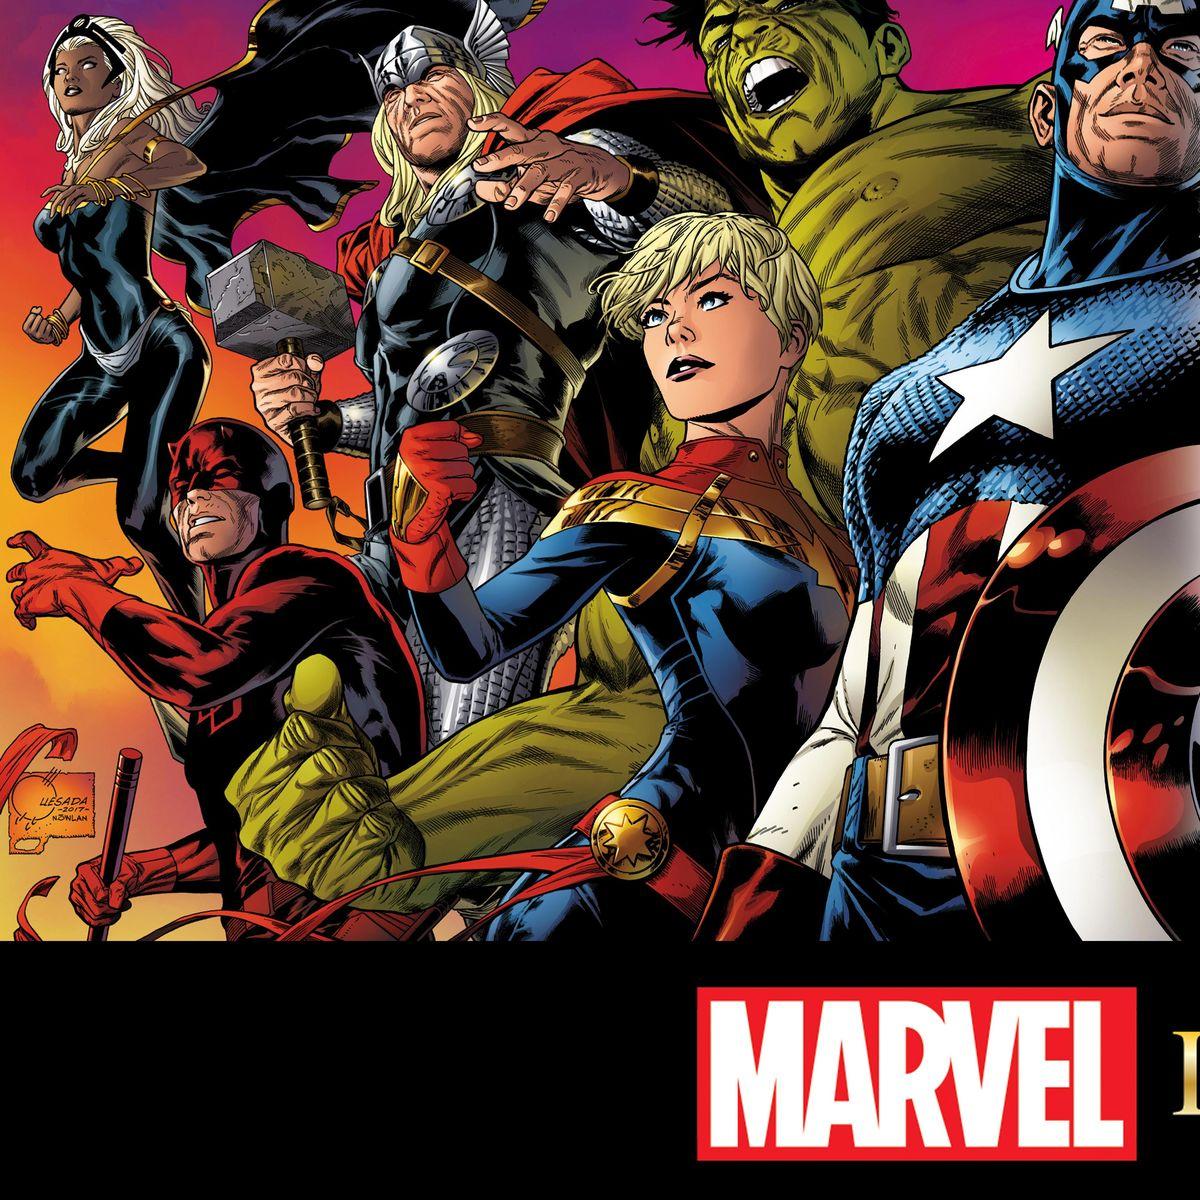 MarvelLegacy.jpg